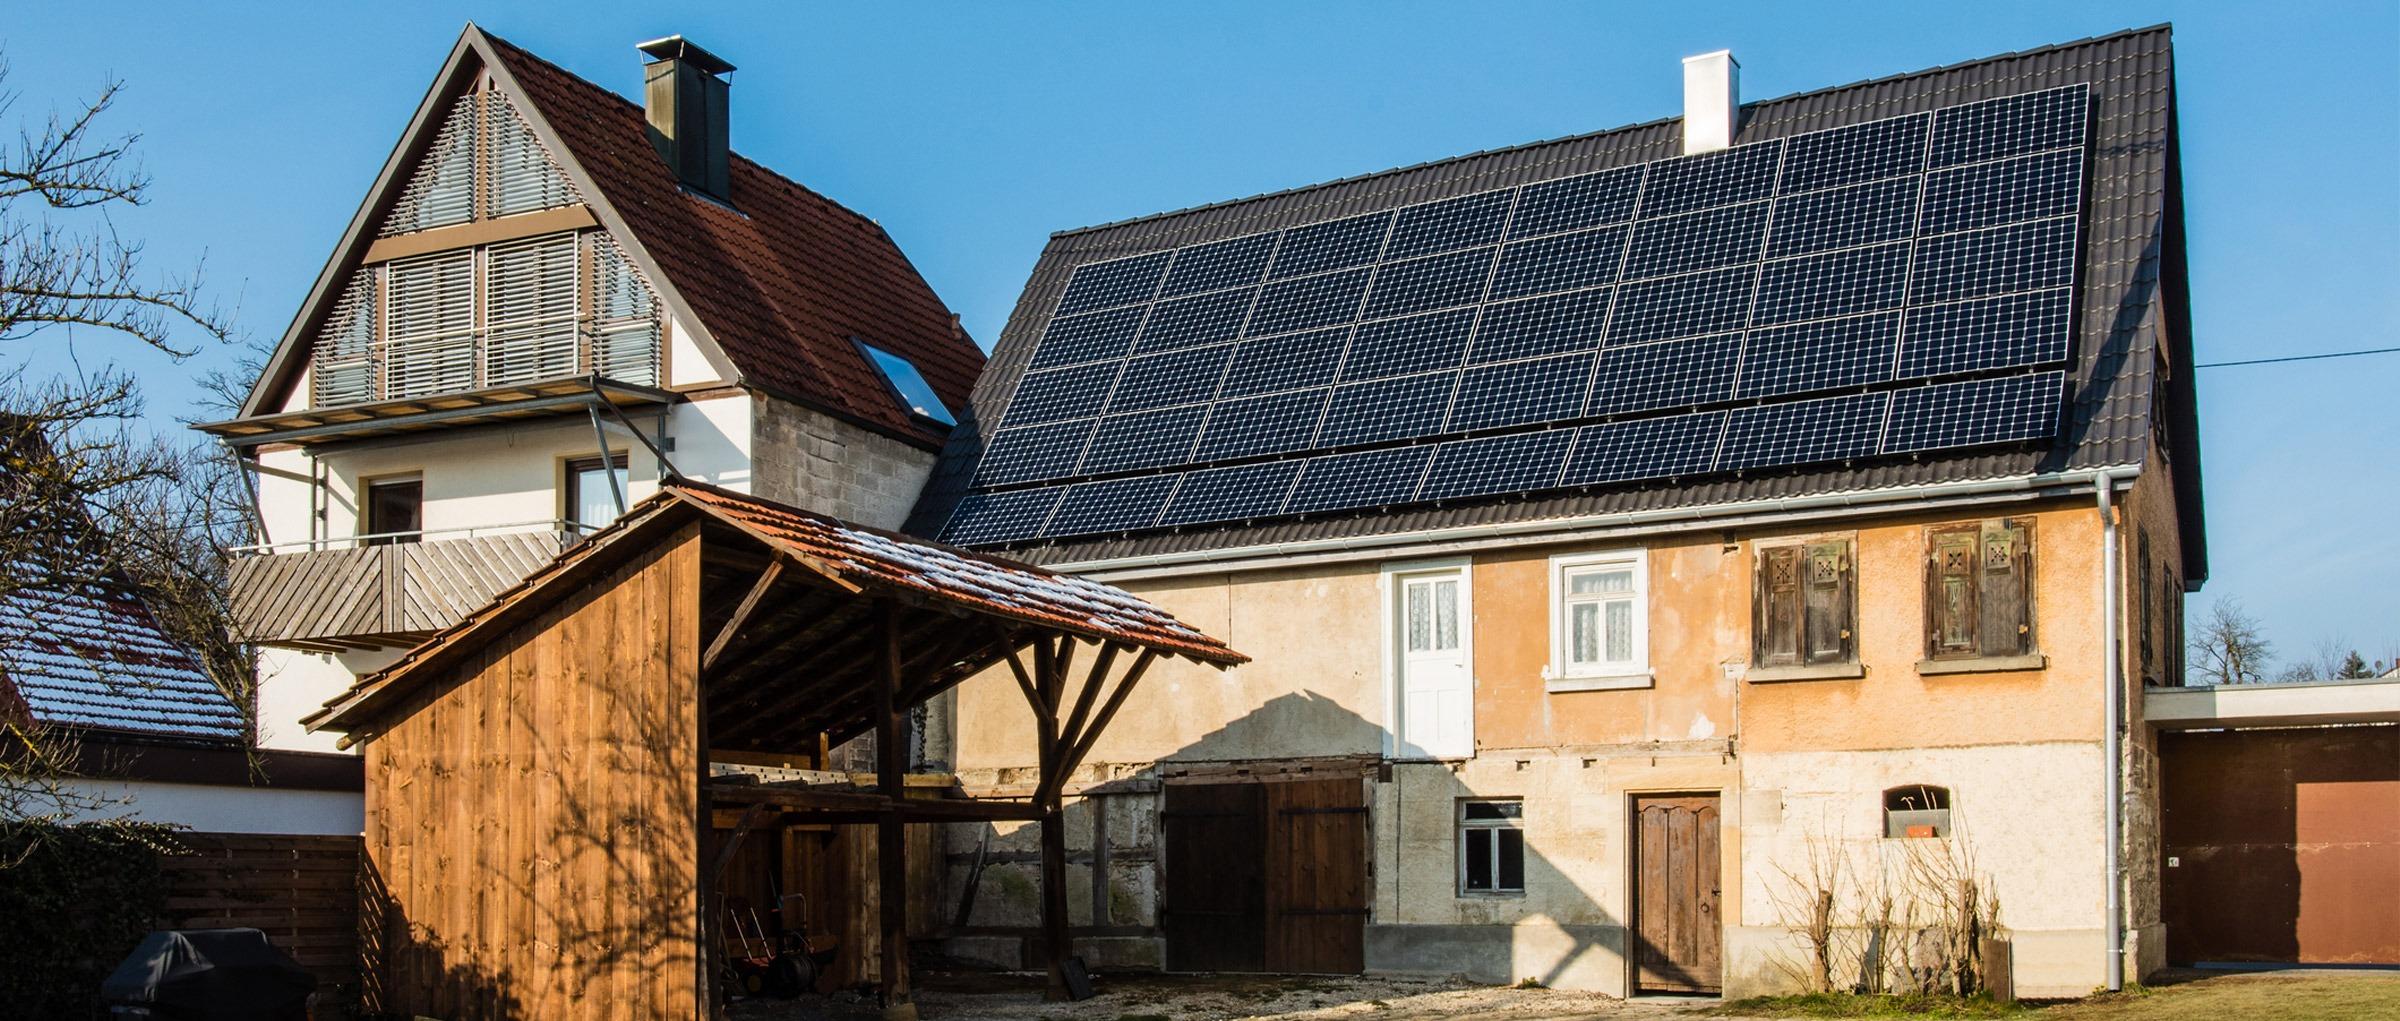 Konjunkturpaket Gebäudesanierung eeg solar